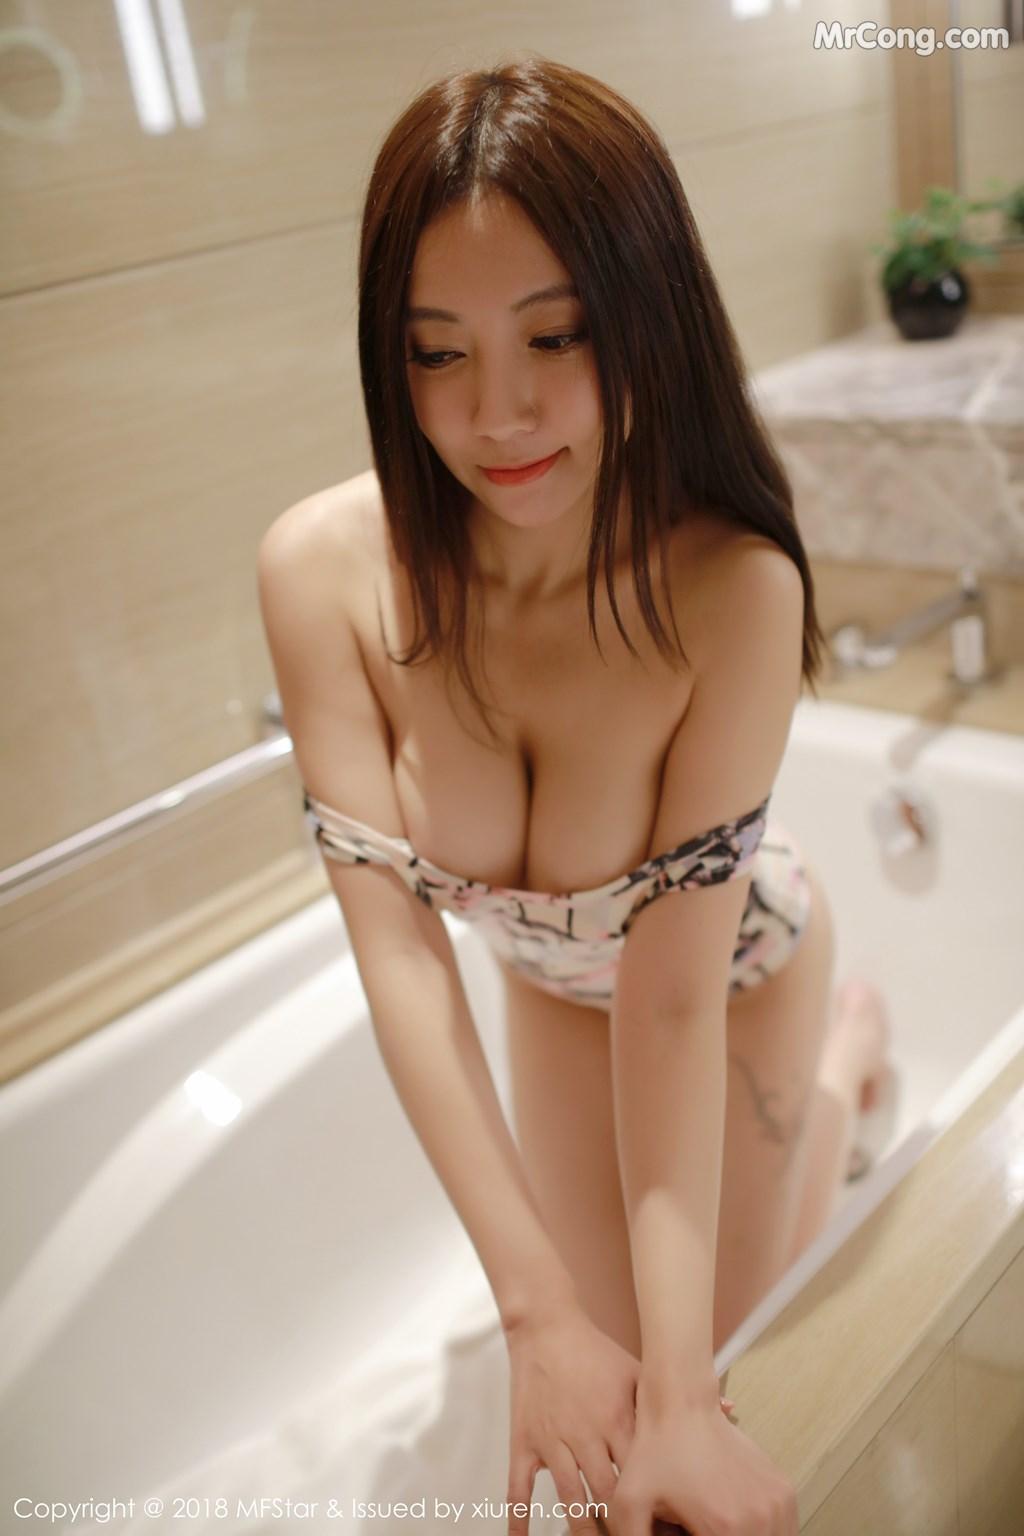 Image MFStar-Vol.151-Victoria-Guo-Er-MrCong.com-005 in post MFStar Vol.151: Người mẫu Victoria (果儿) (52 ảnh)